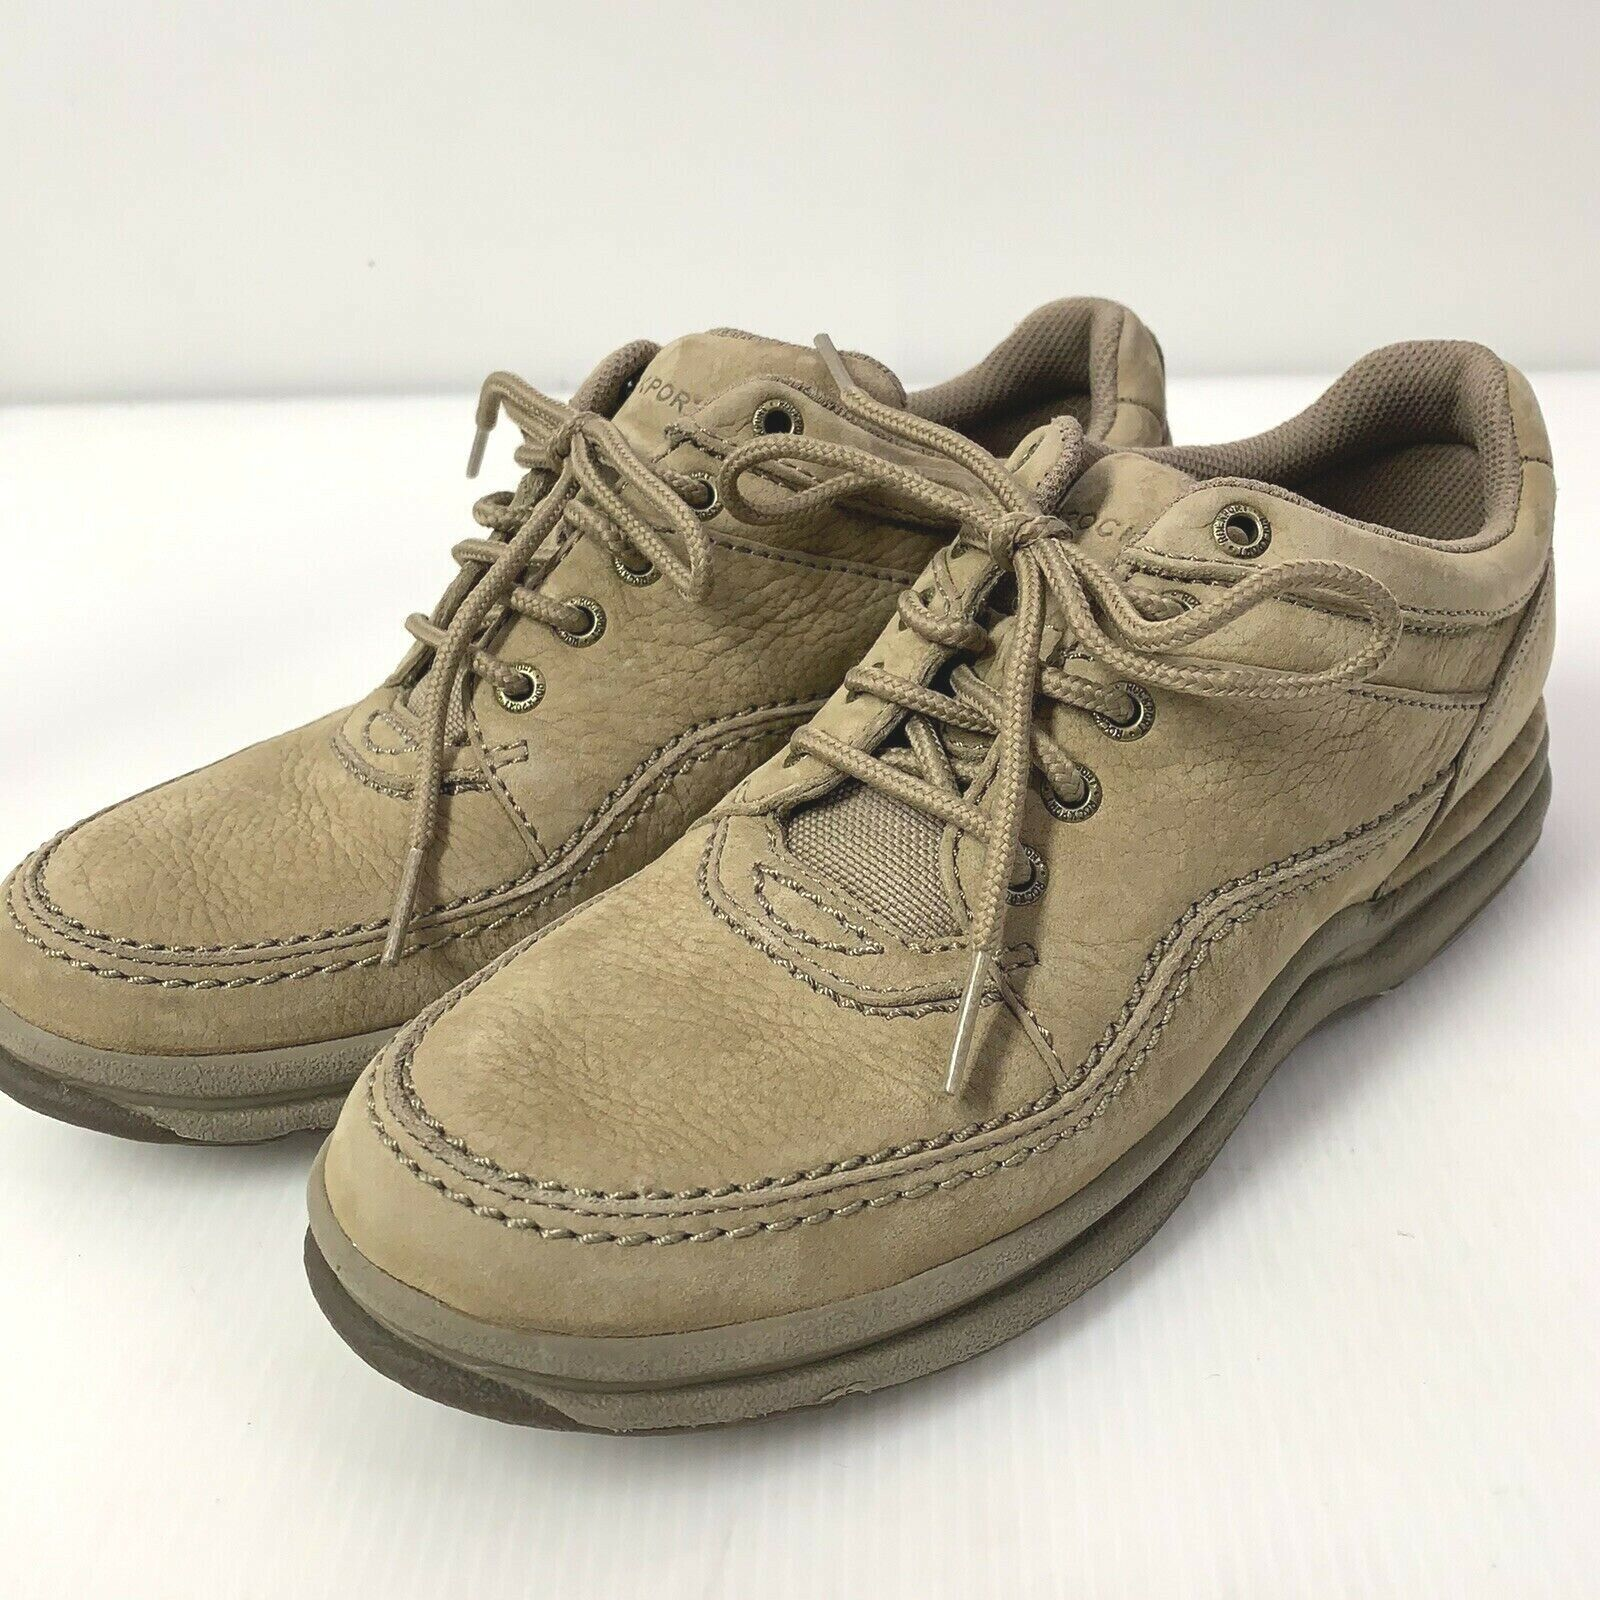 GENTLY USED Rockport Walking Shoe Tan Leather WWT13M Sz 8 - $24.99